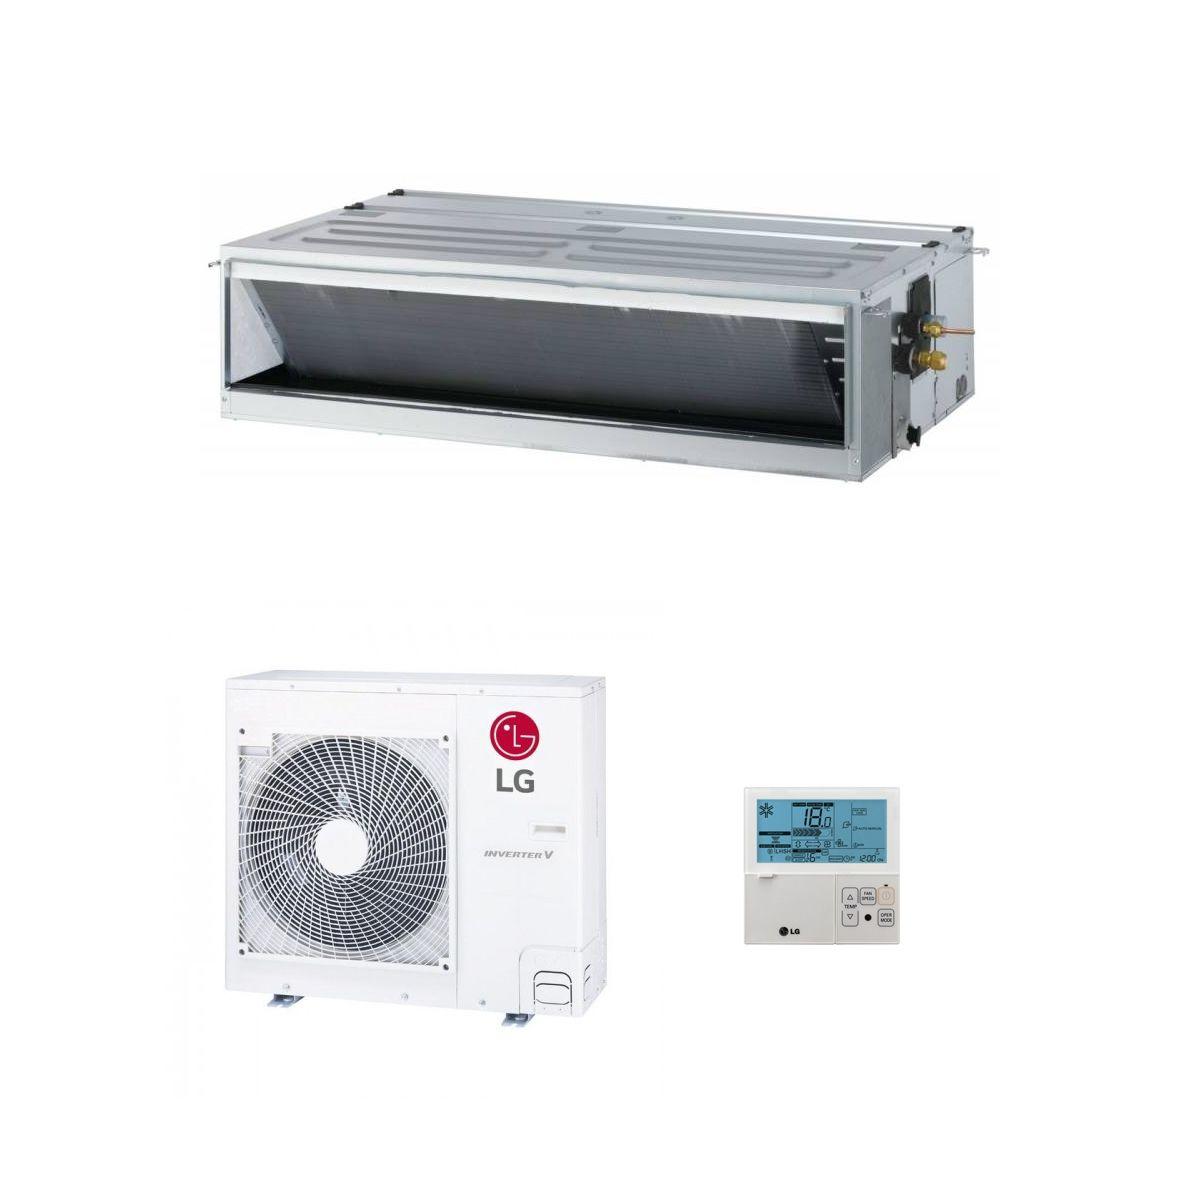 lg air conditioning um30n14 ducted heat pump 9kw 30000btu standard